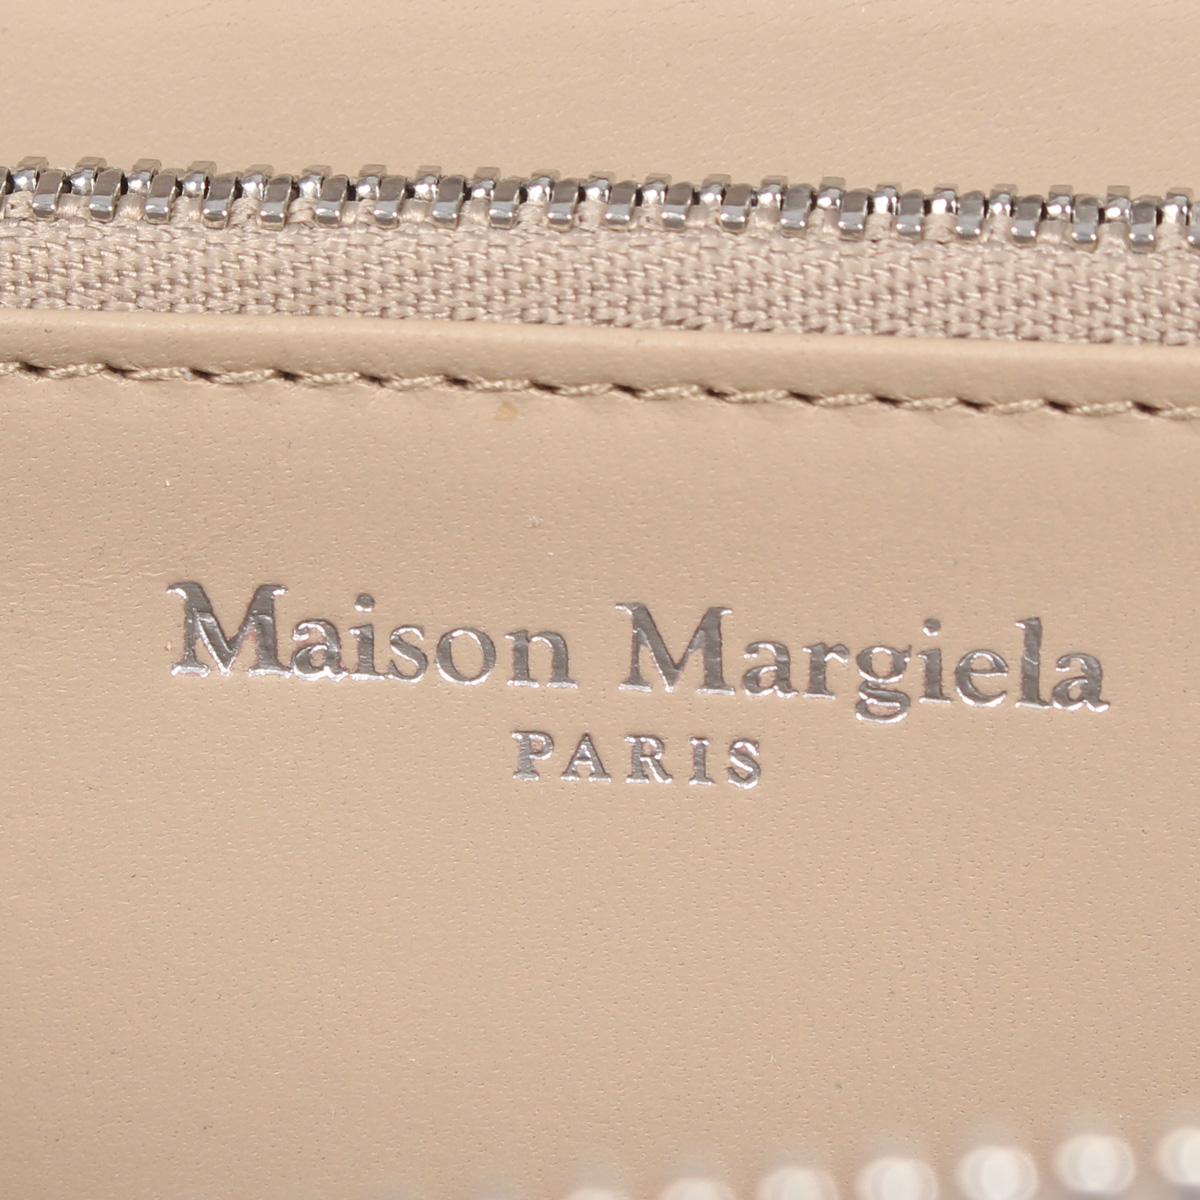 MAISON MARGIELA LONG WALLET メゾンマルジェラ 財布 長財布 メンズ レディース ベージュ S35UIoCBexd